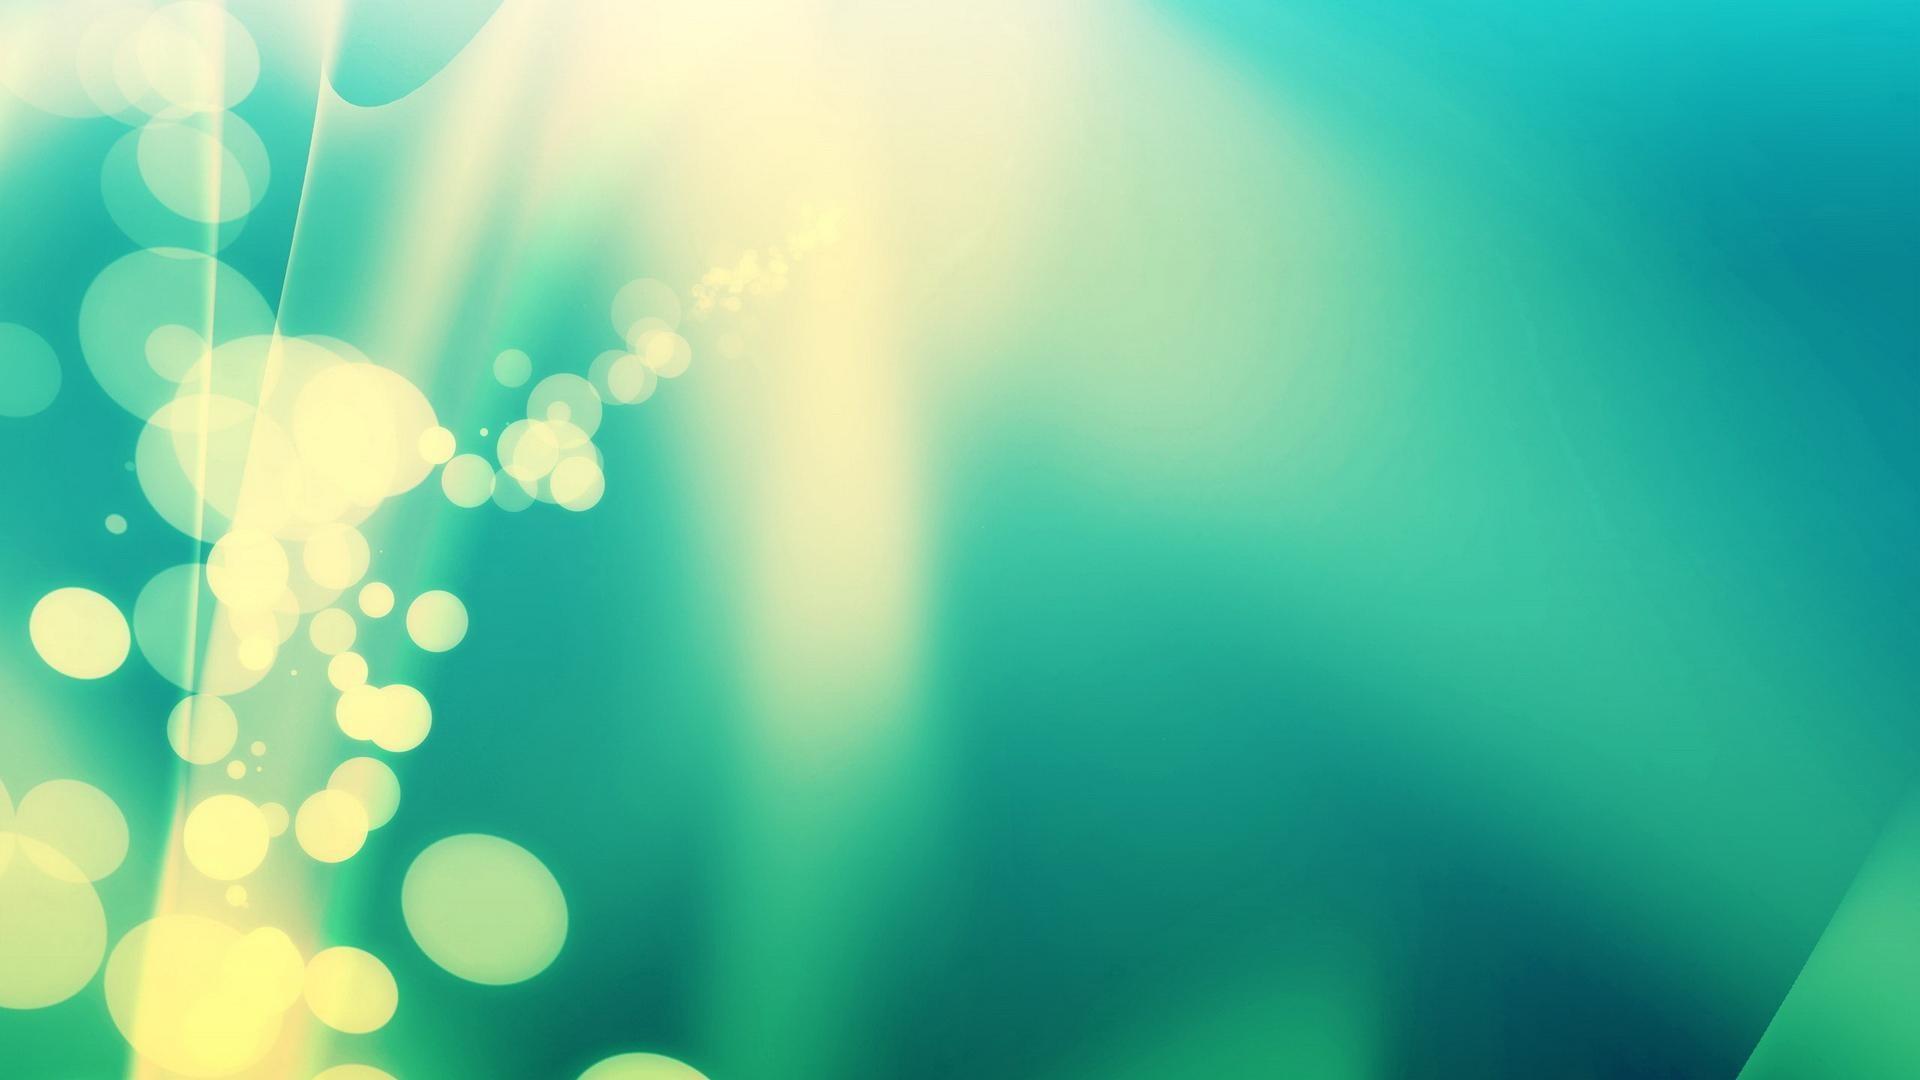 Vector Light Green Backgrounds Widescreen and HD background Wallpaper